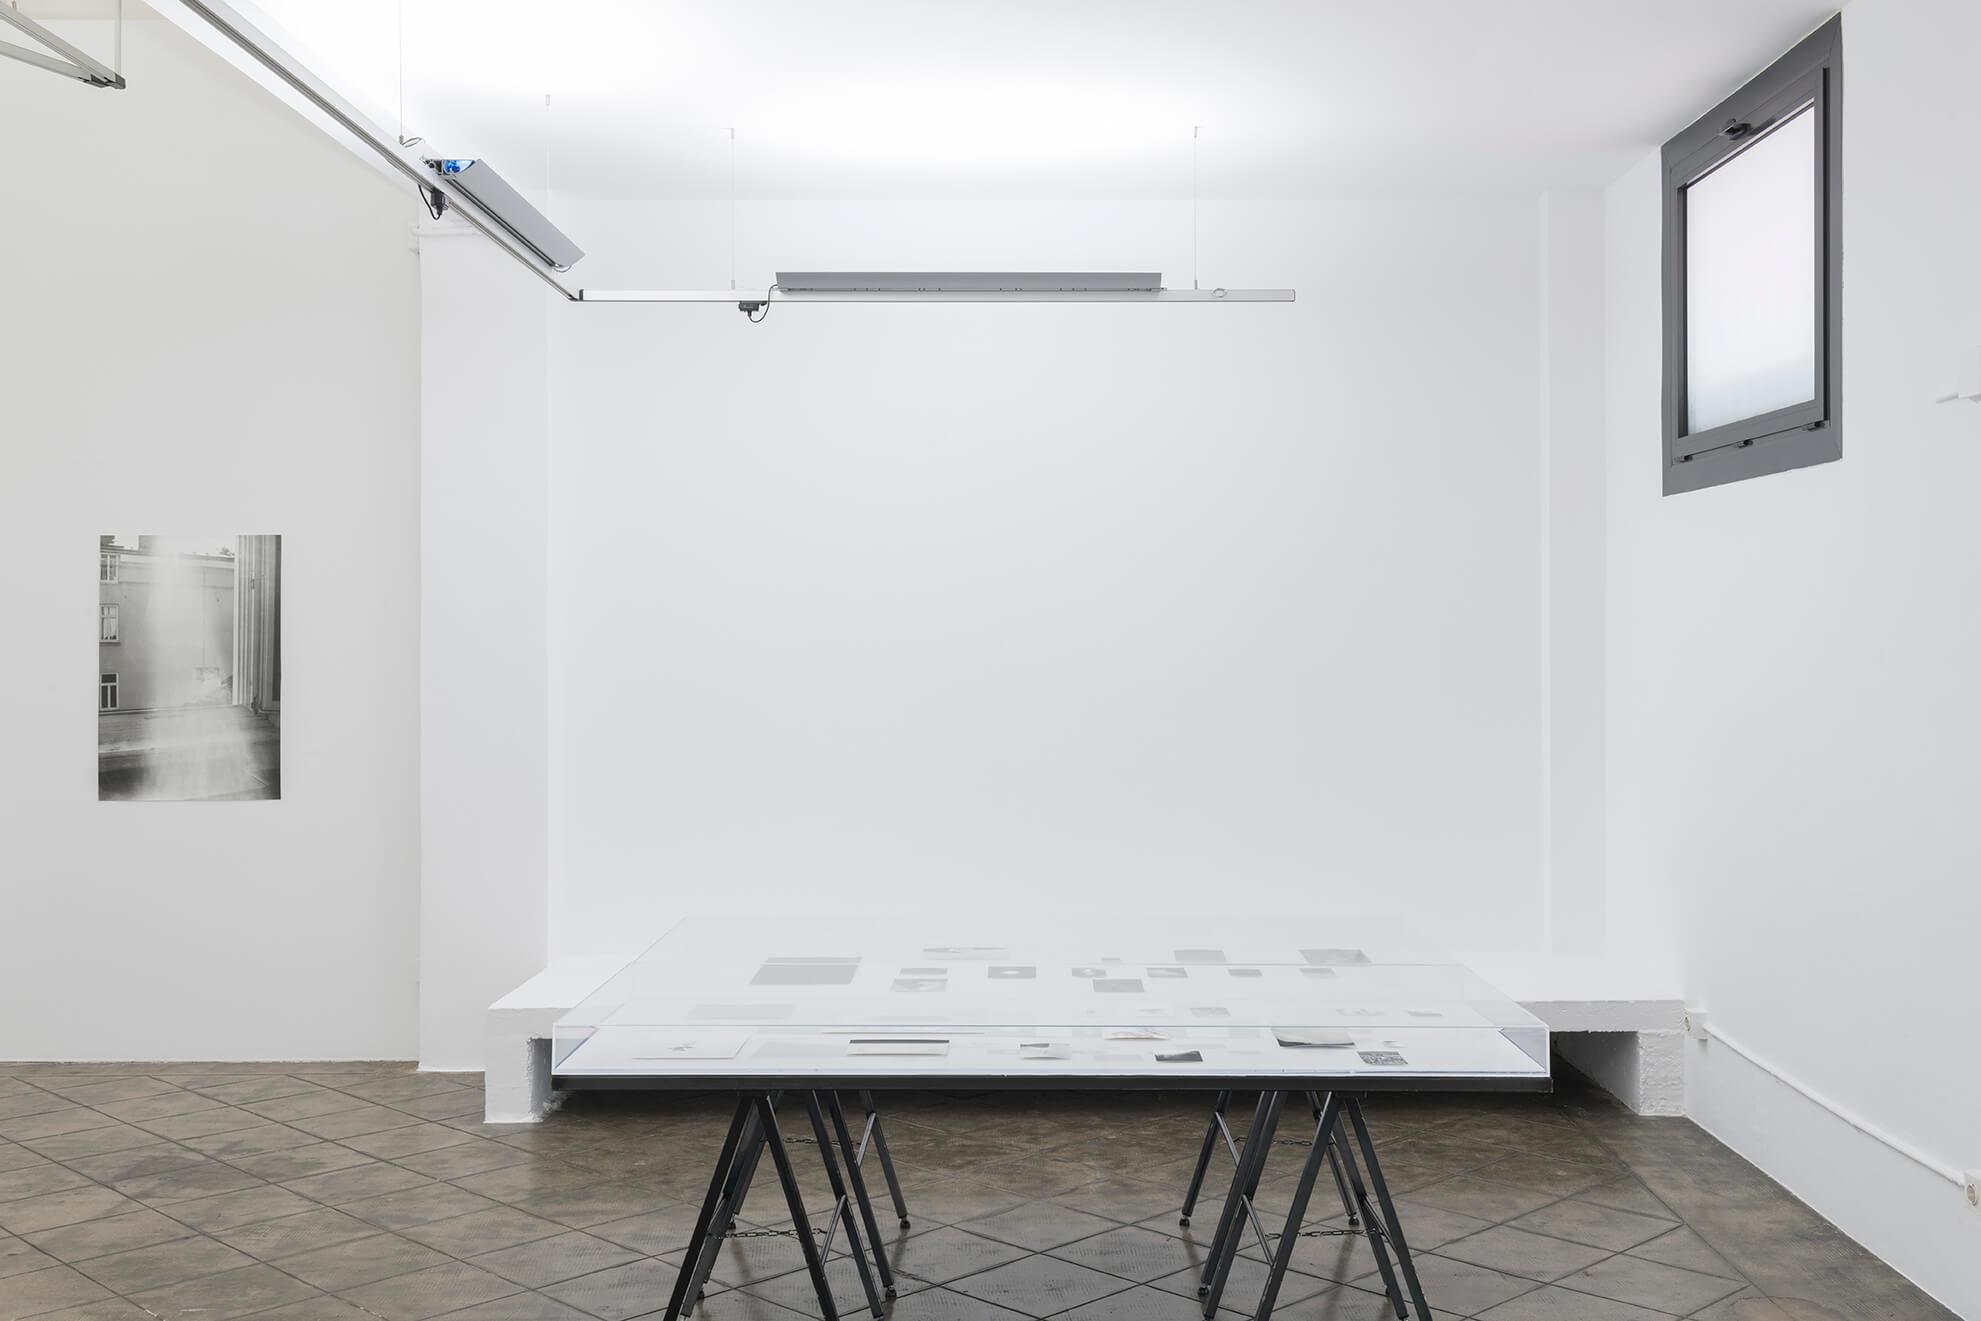 Installation view: Visible Light, ProjecteSD | JOCHEN LEMPERT: VISIBLE LIGHT | ProjecteSD